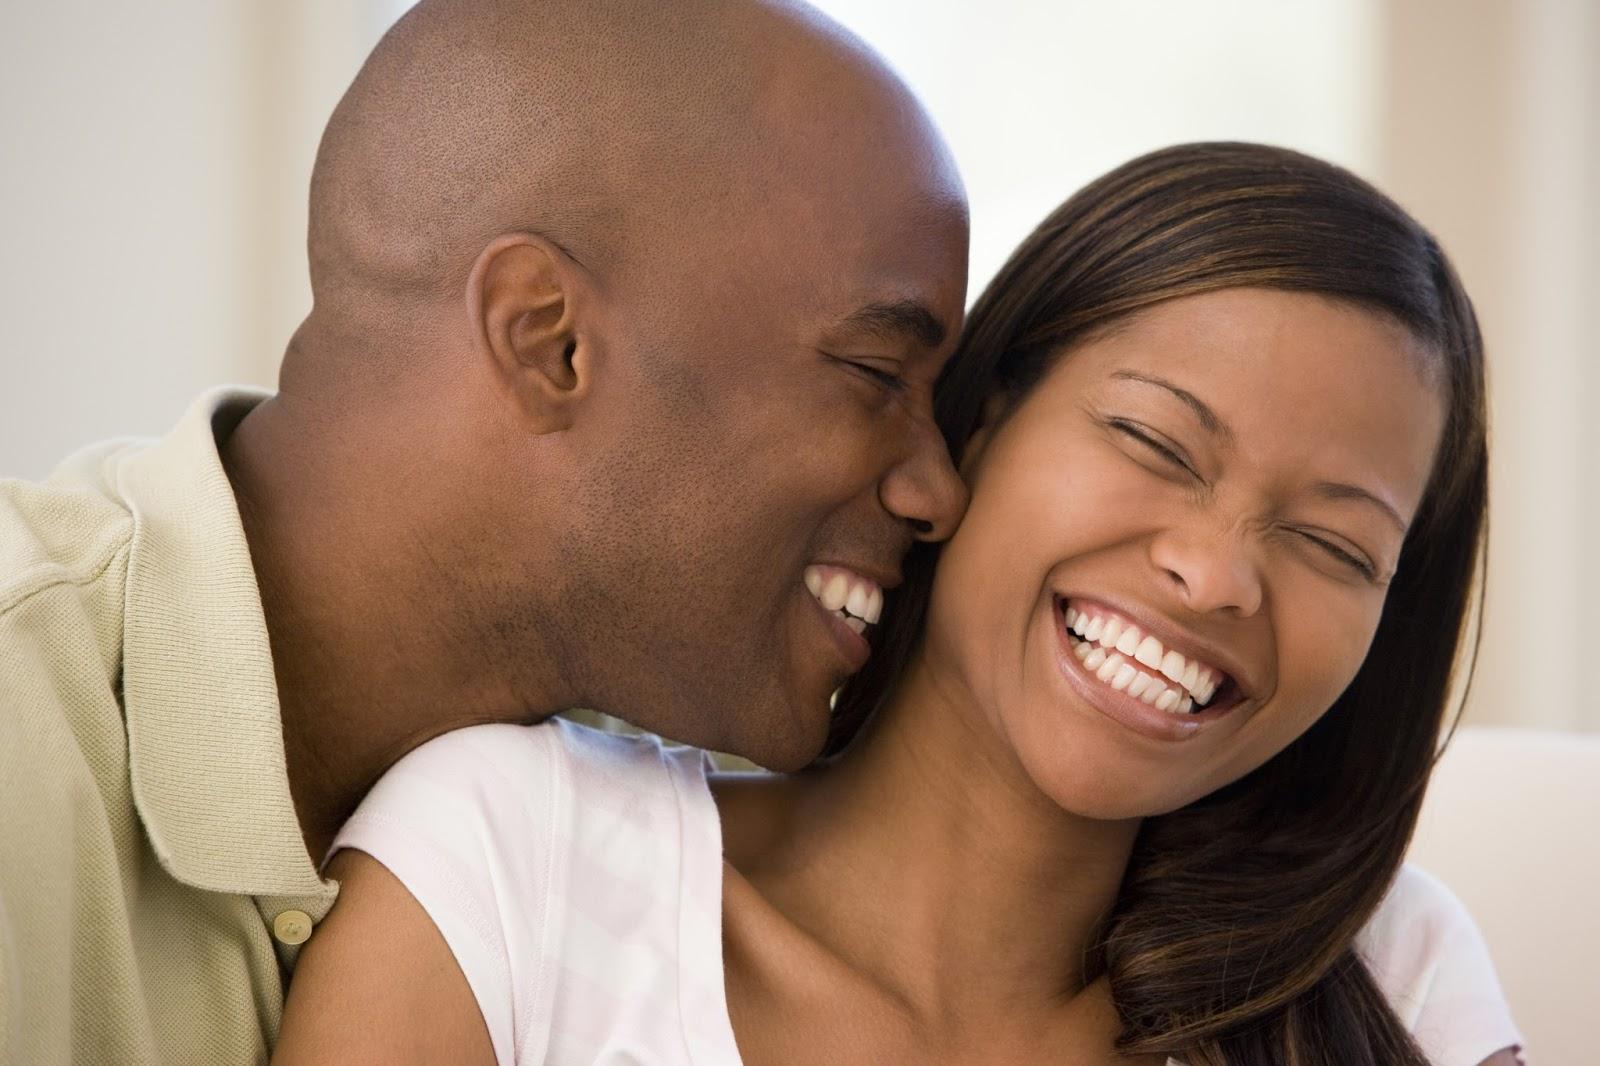 Her wife love you show ways to 5 Ways